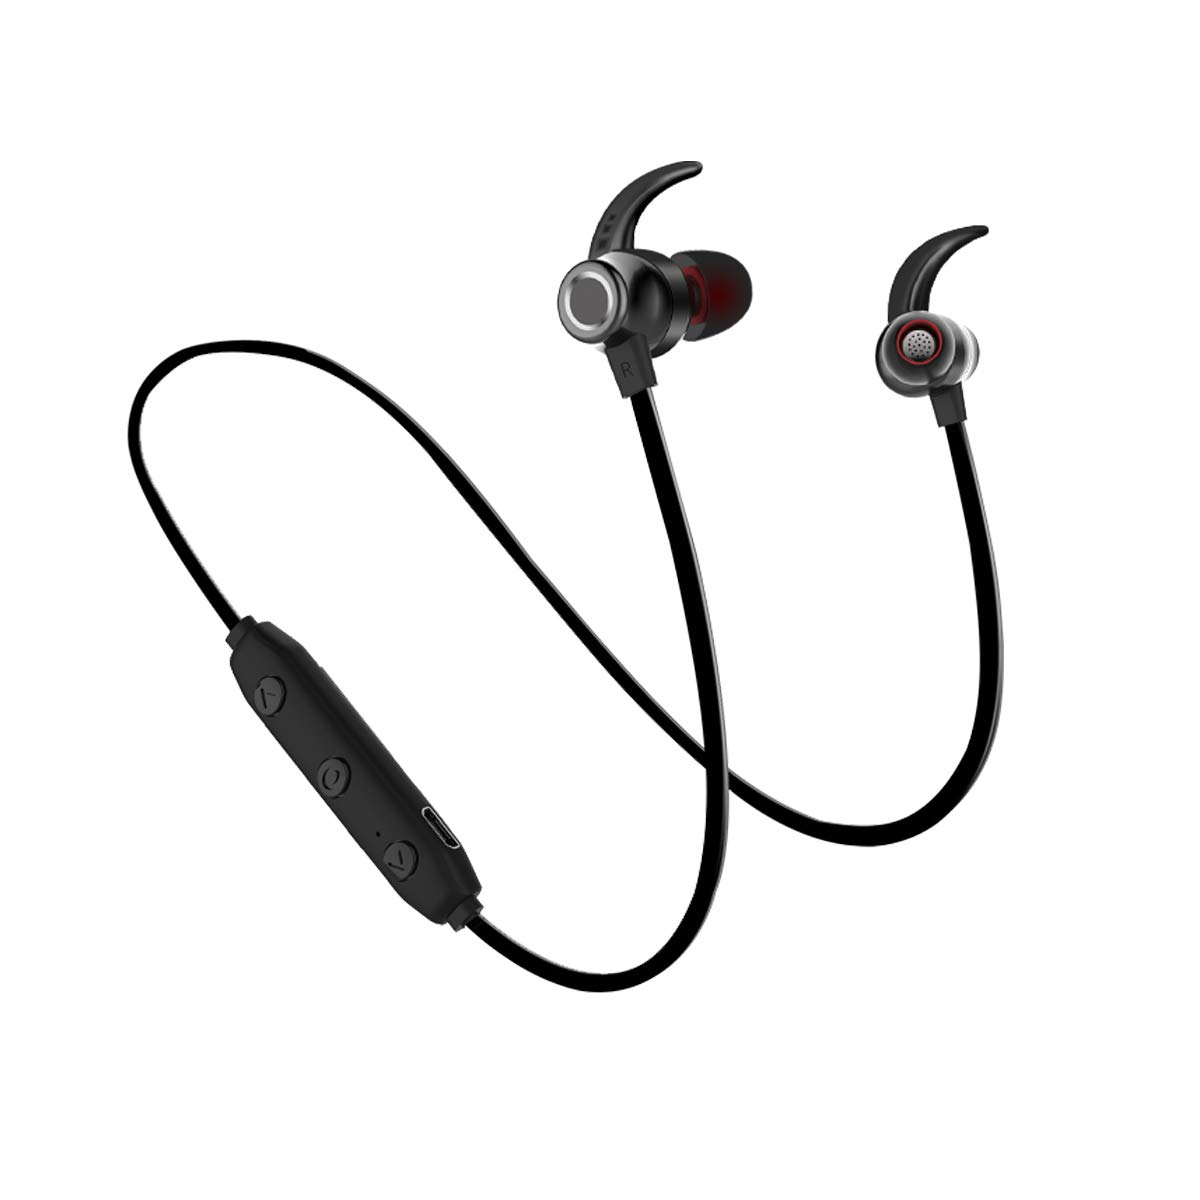 694425a1563 Wireless Bluetooth Earphone Noice Cancelling Earbuds Earplug Headphones for  Runner Headset with MIC Sweatproof & Waterproof Bluetooth 4.1